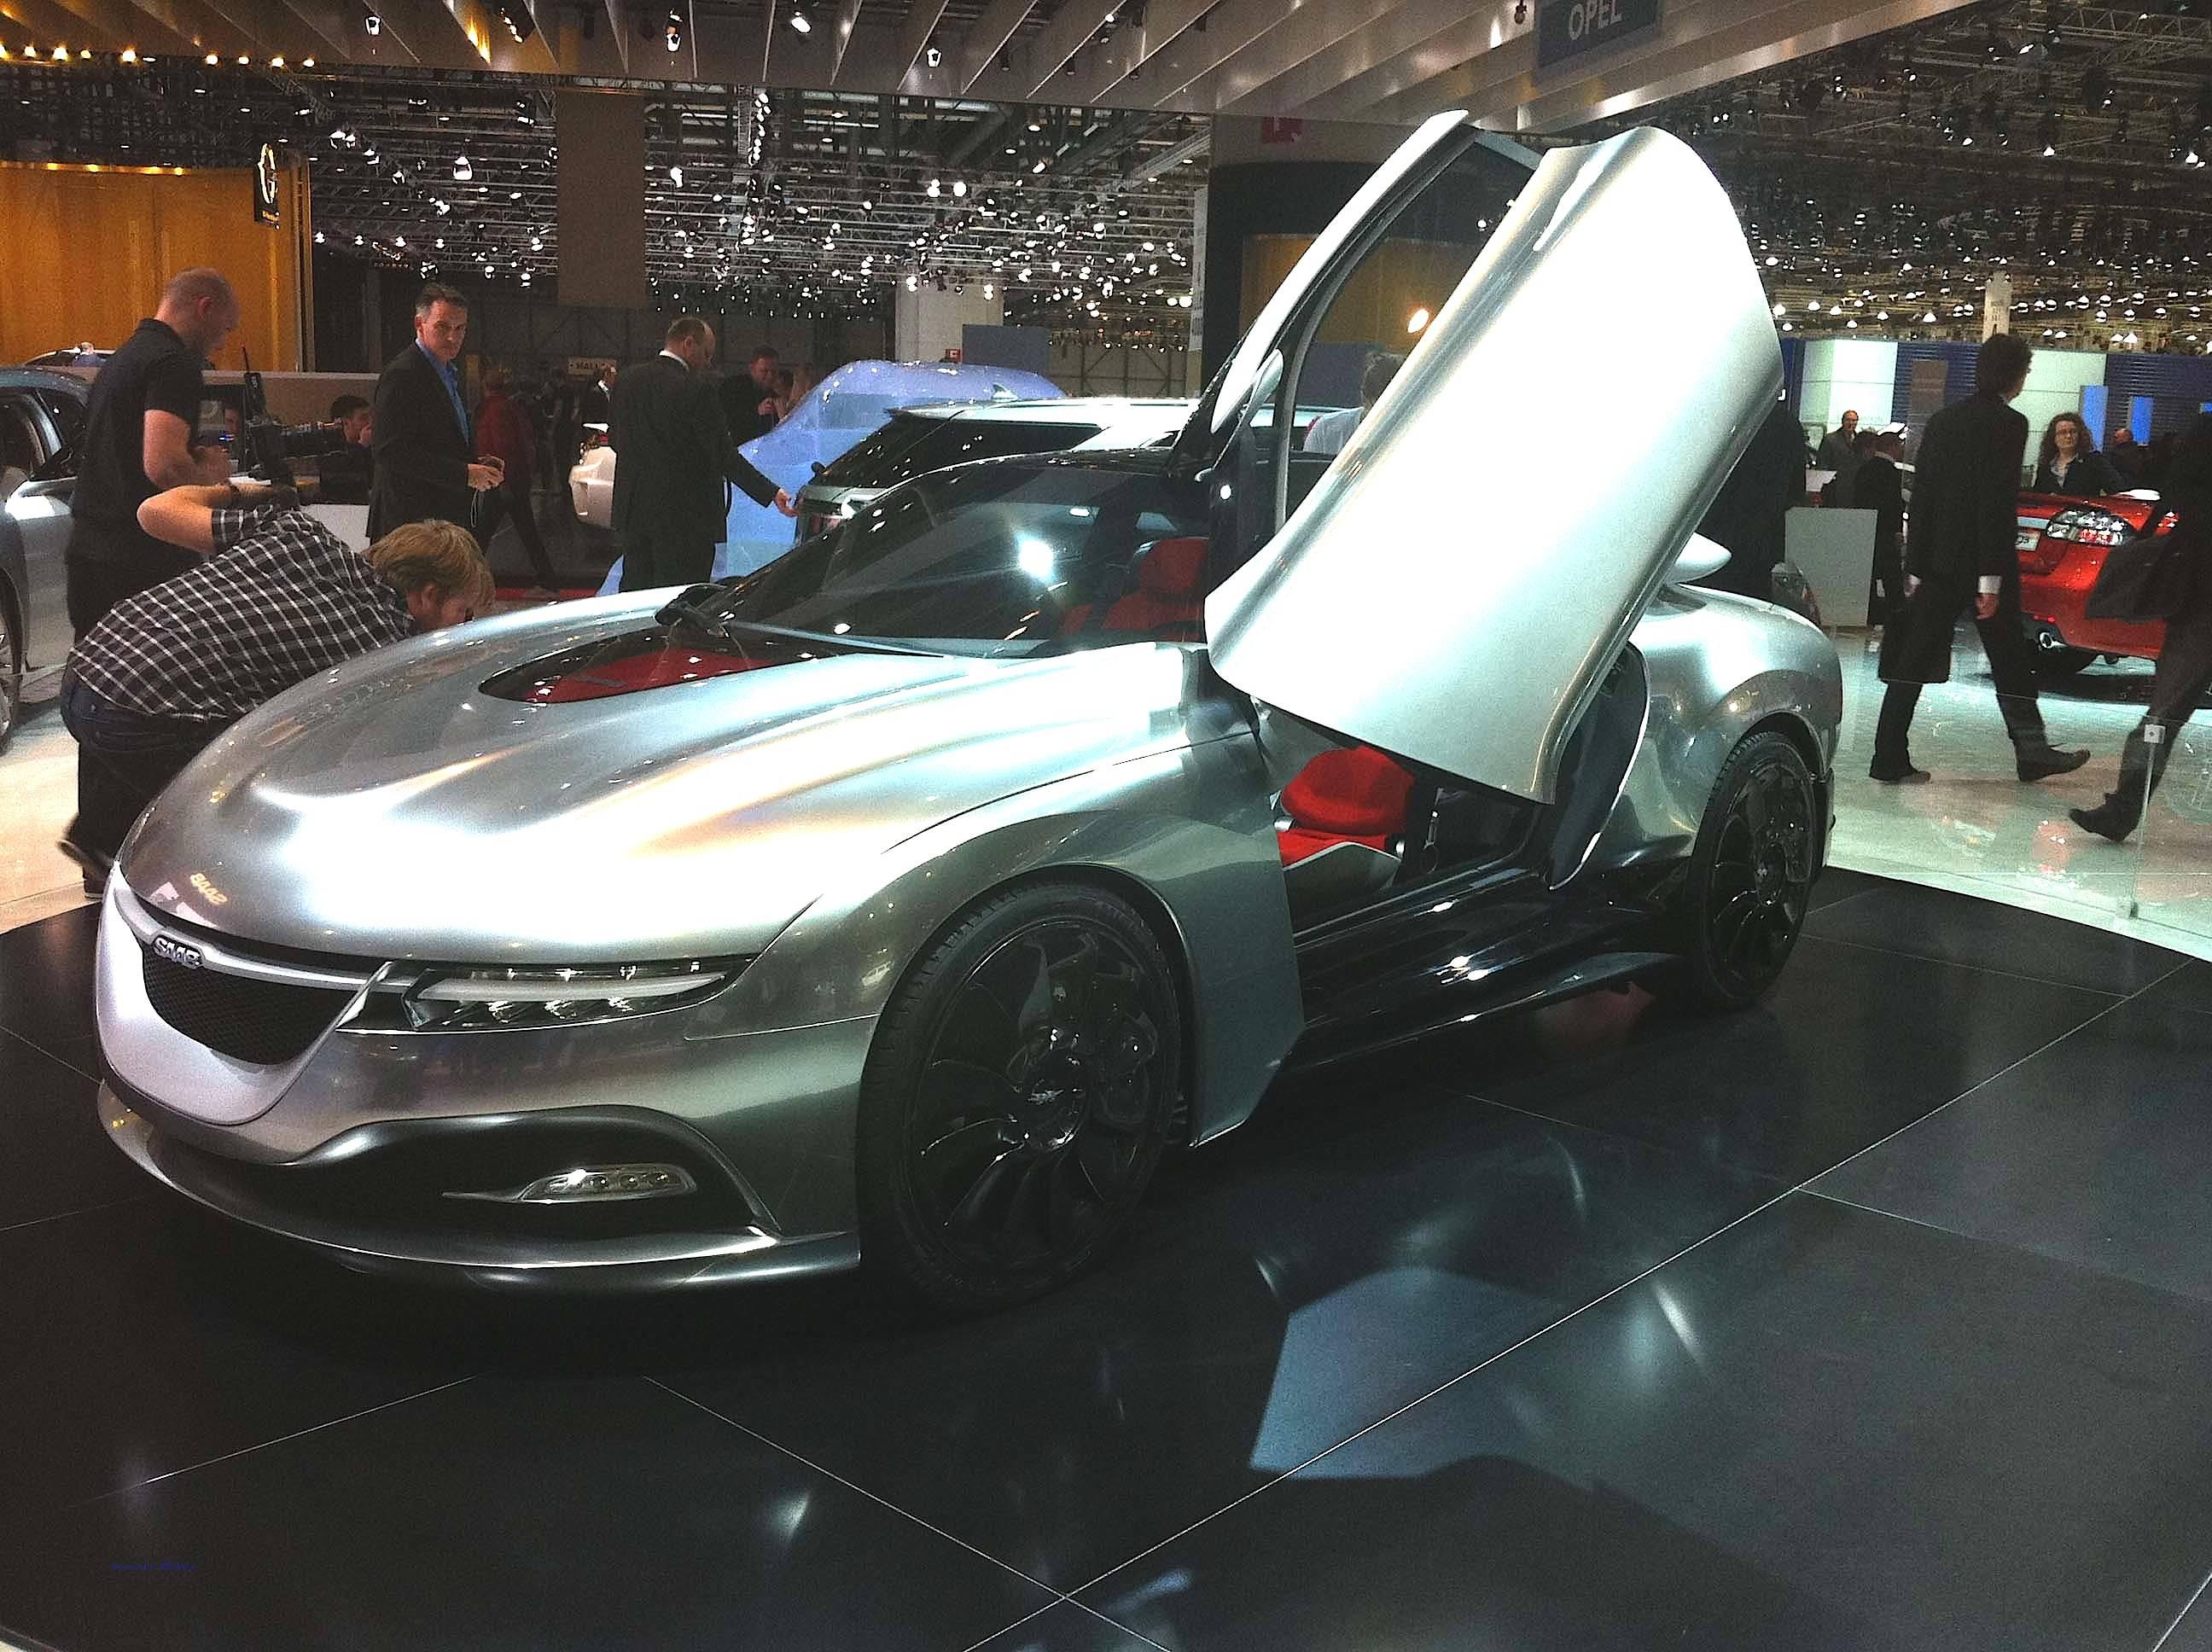 Geneva Motor Show - Concept Saab PhoeniX